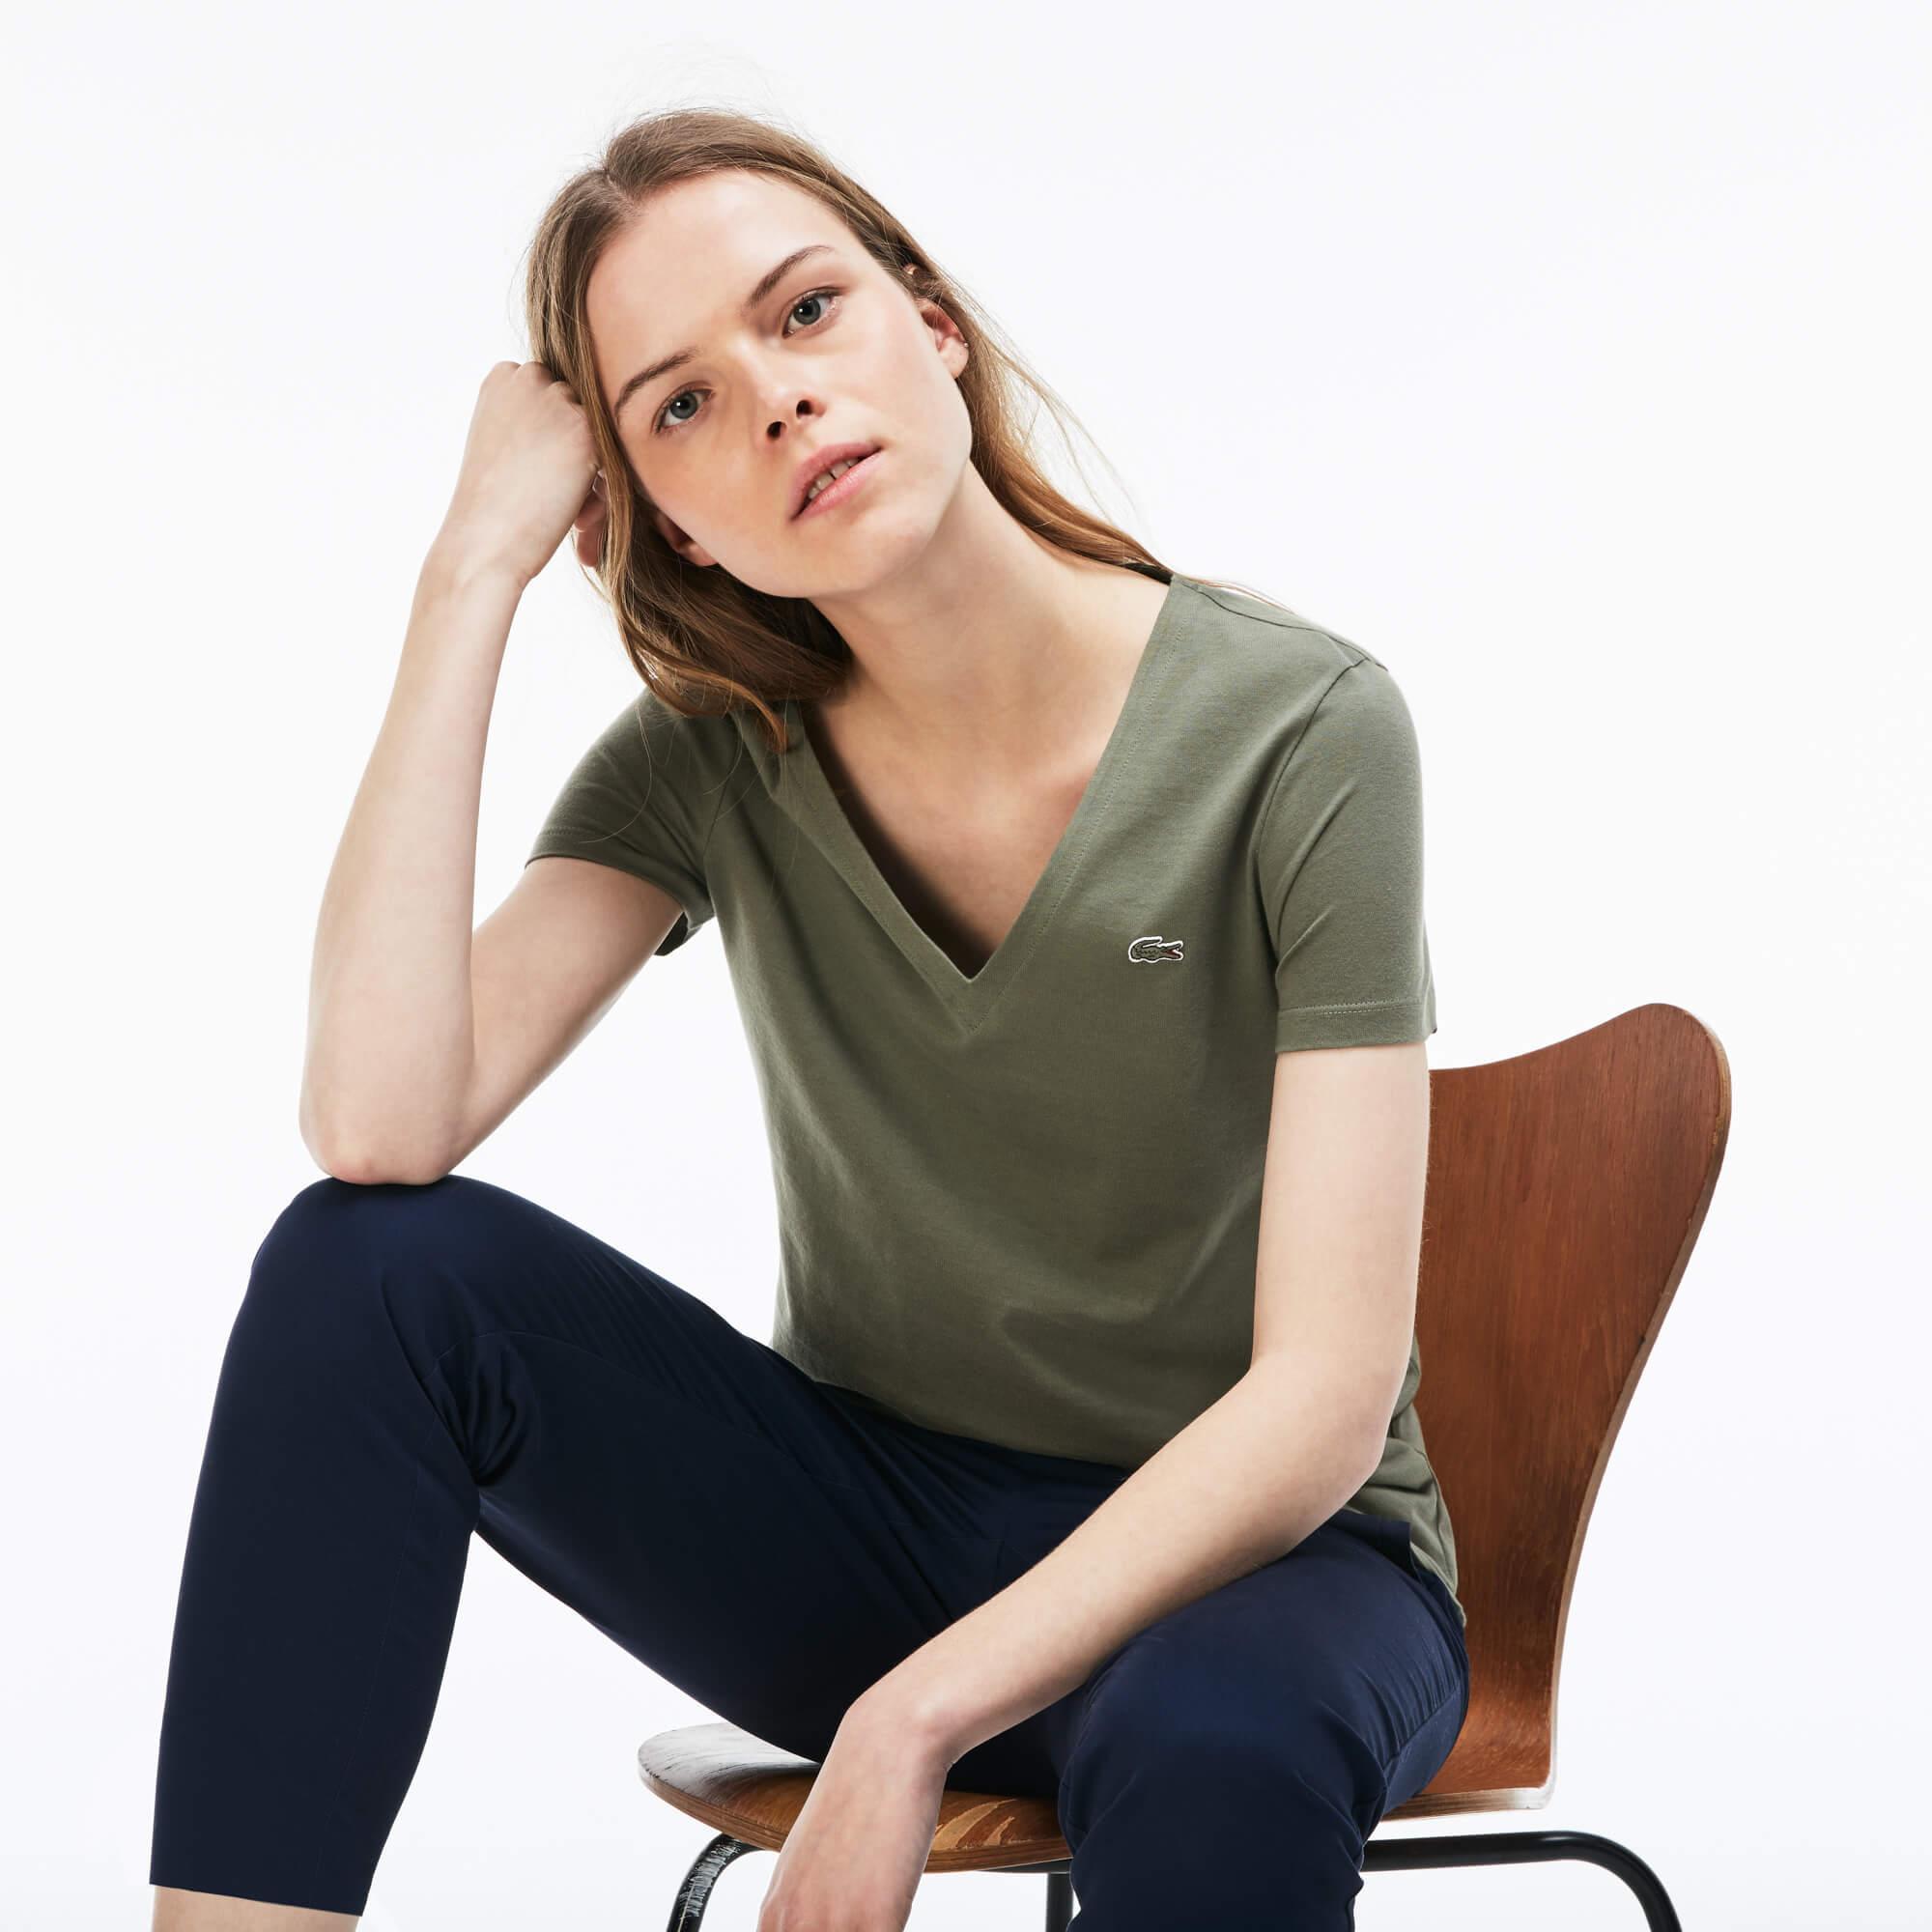 Lacoste Kadın V Yaka Yeşil T-Shirt